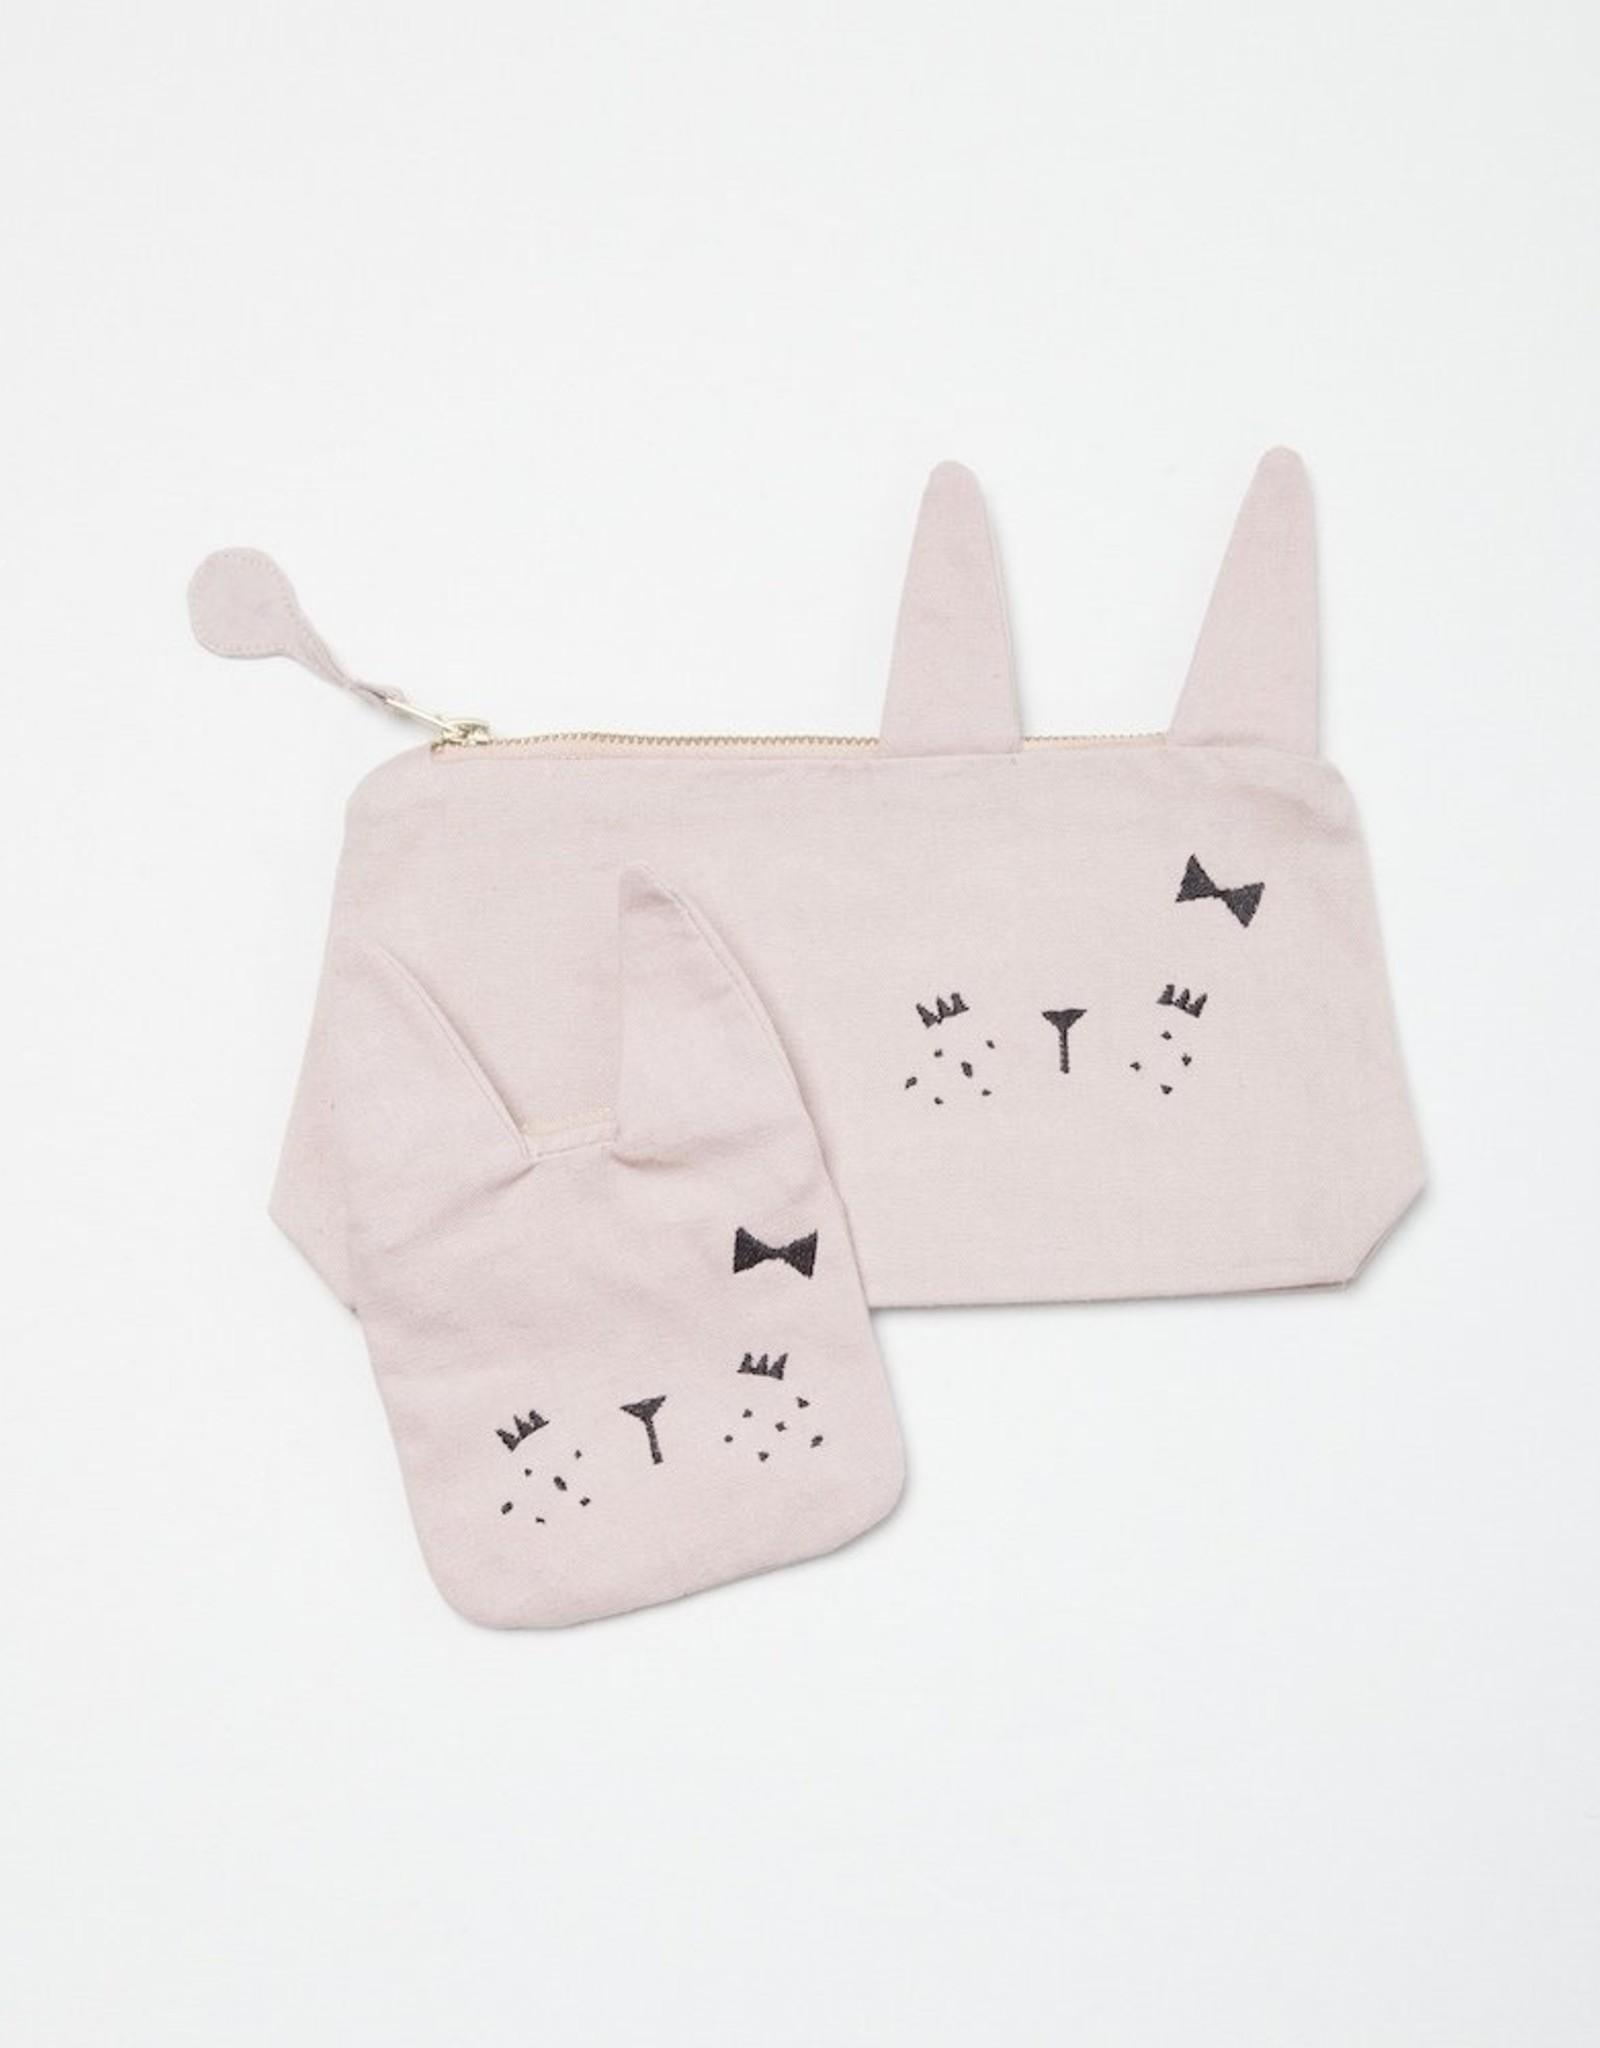 FABELAB Fabelab pencil case - Cute bunny